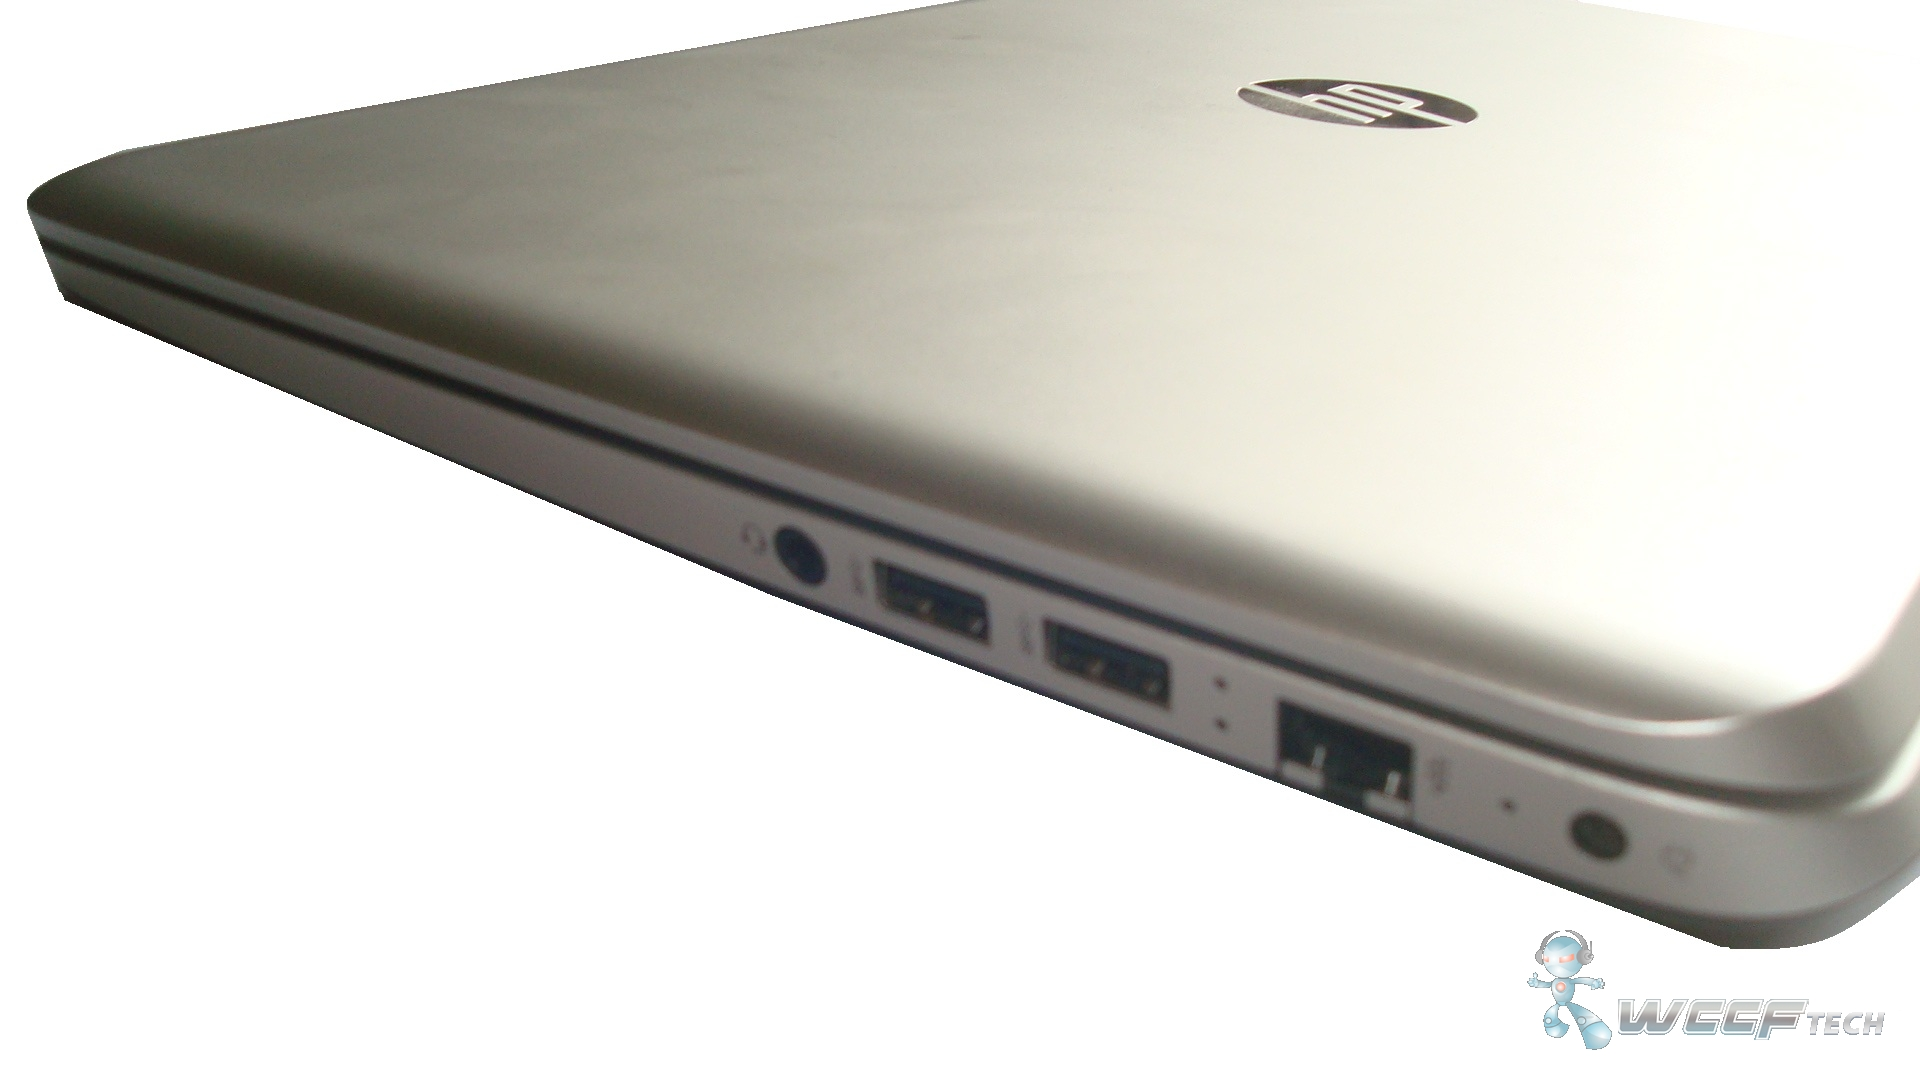 HP ENVY 15t-j000 Treiber Windows XP